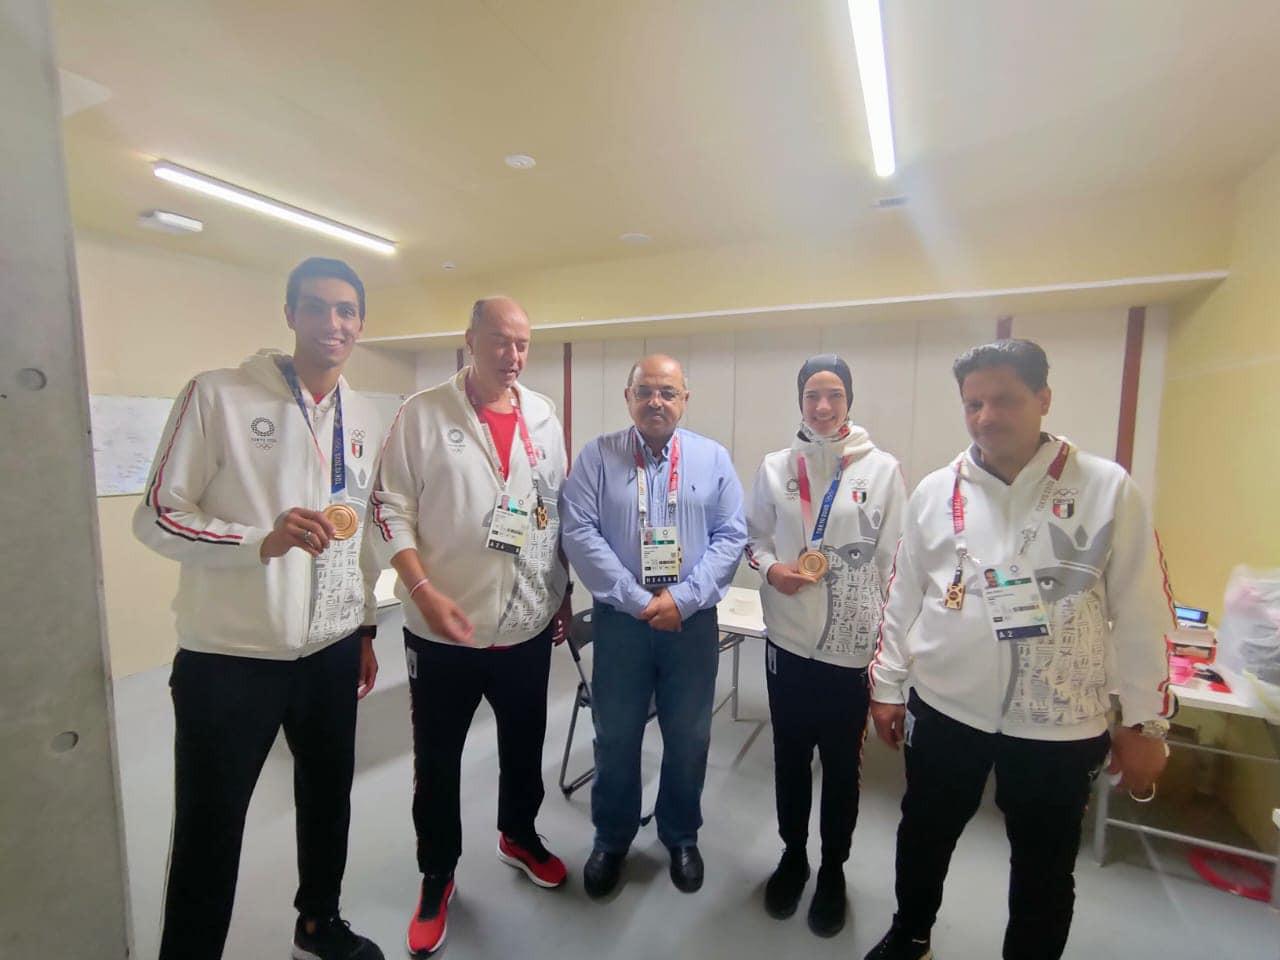 Egyptian taekwondo medallists rewarded by country's NOC